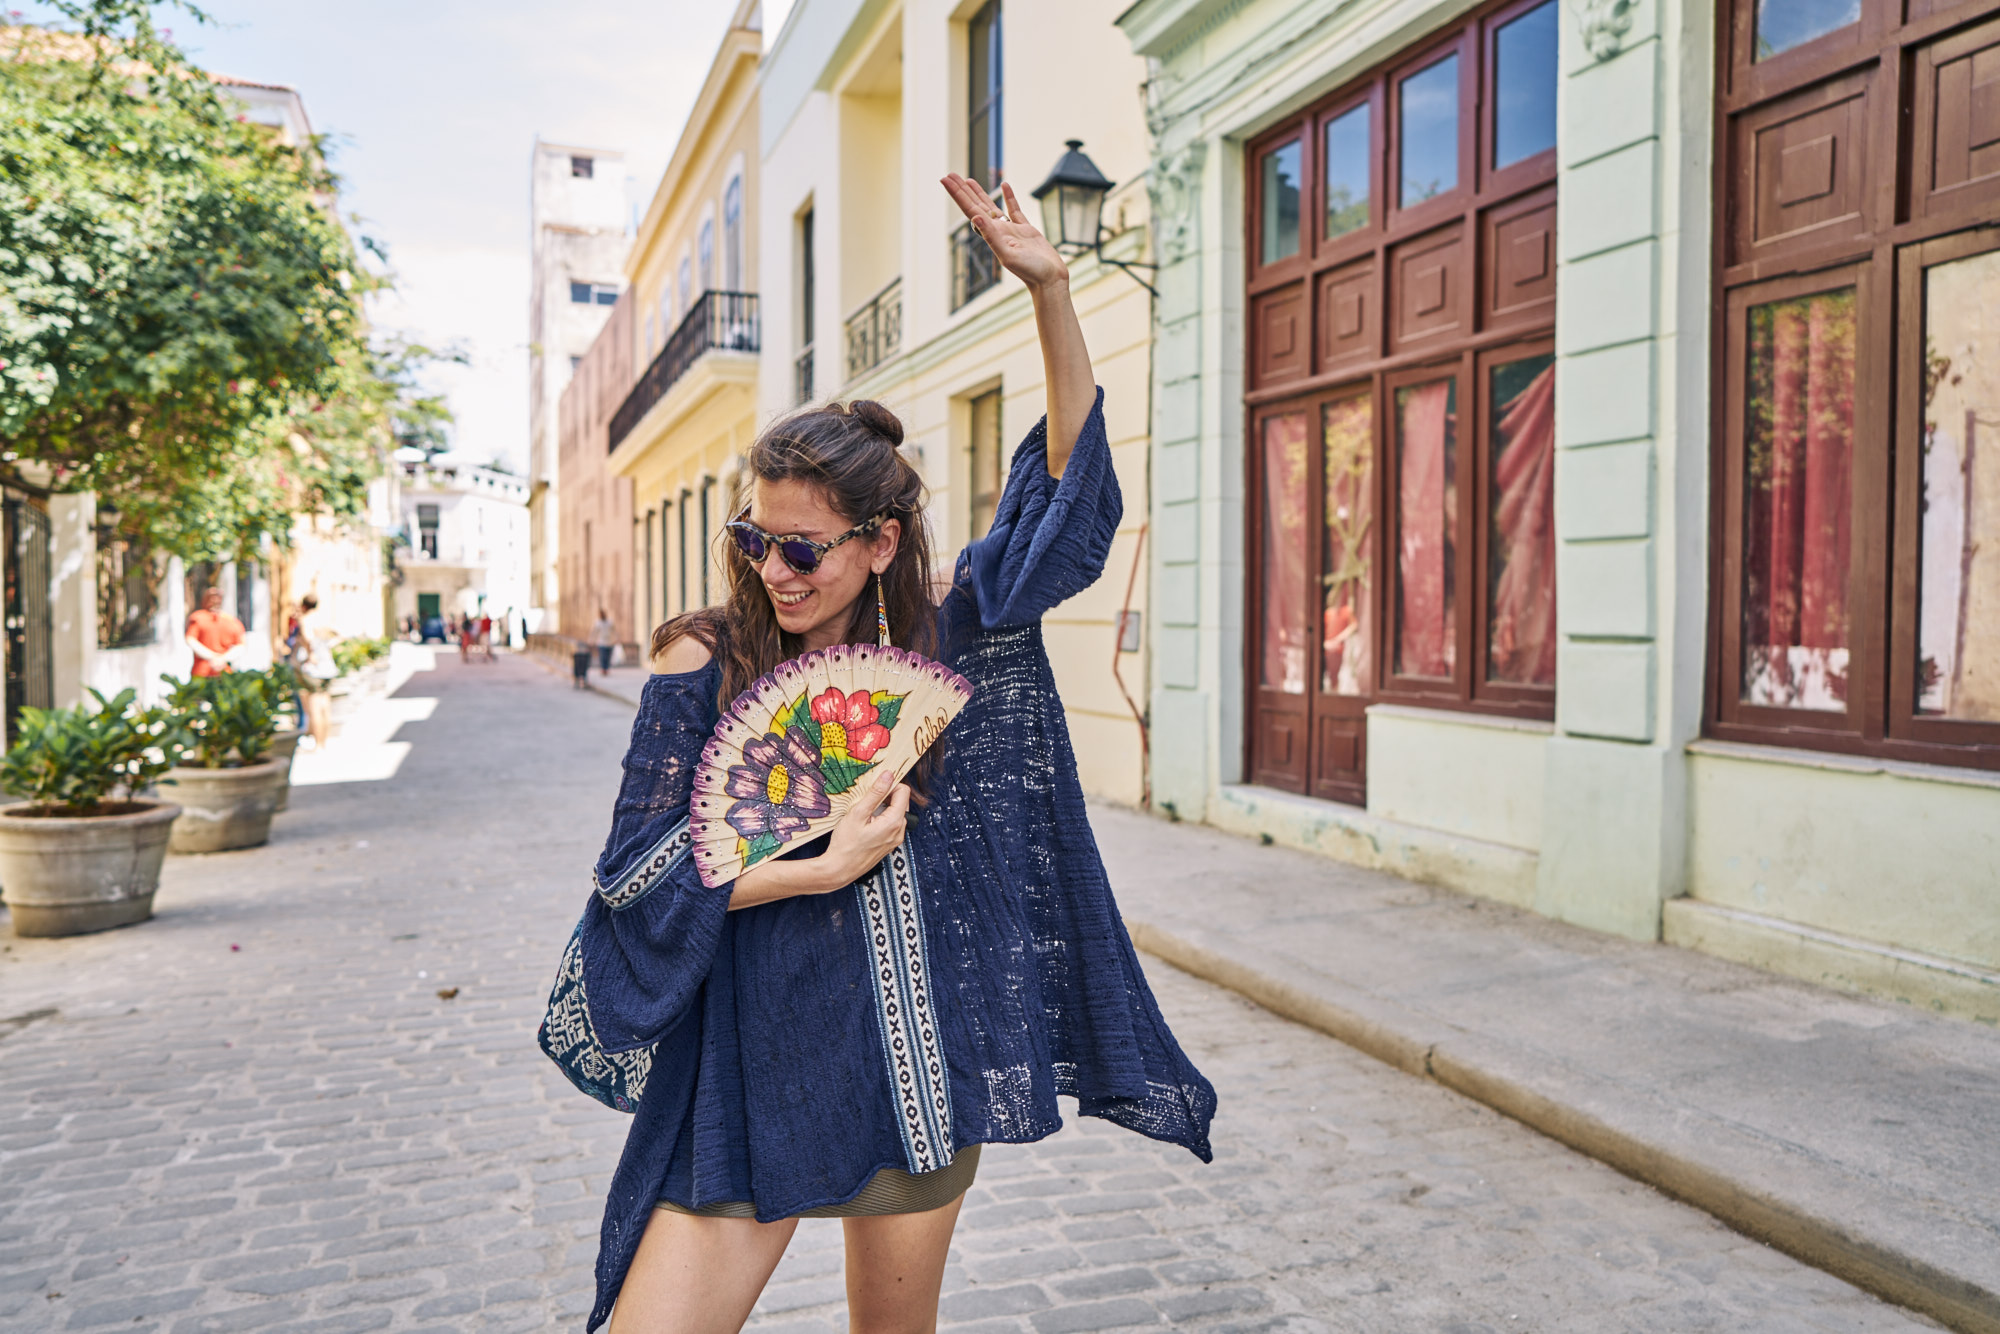 billur saatci, offnegiysem, street style, turkish style blogger, cuba, küba, billurcubadiary, offnereyegitsem, 1 mayıs'ta küba, vipileküba